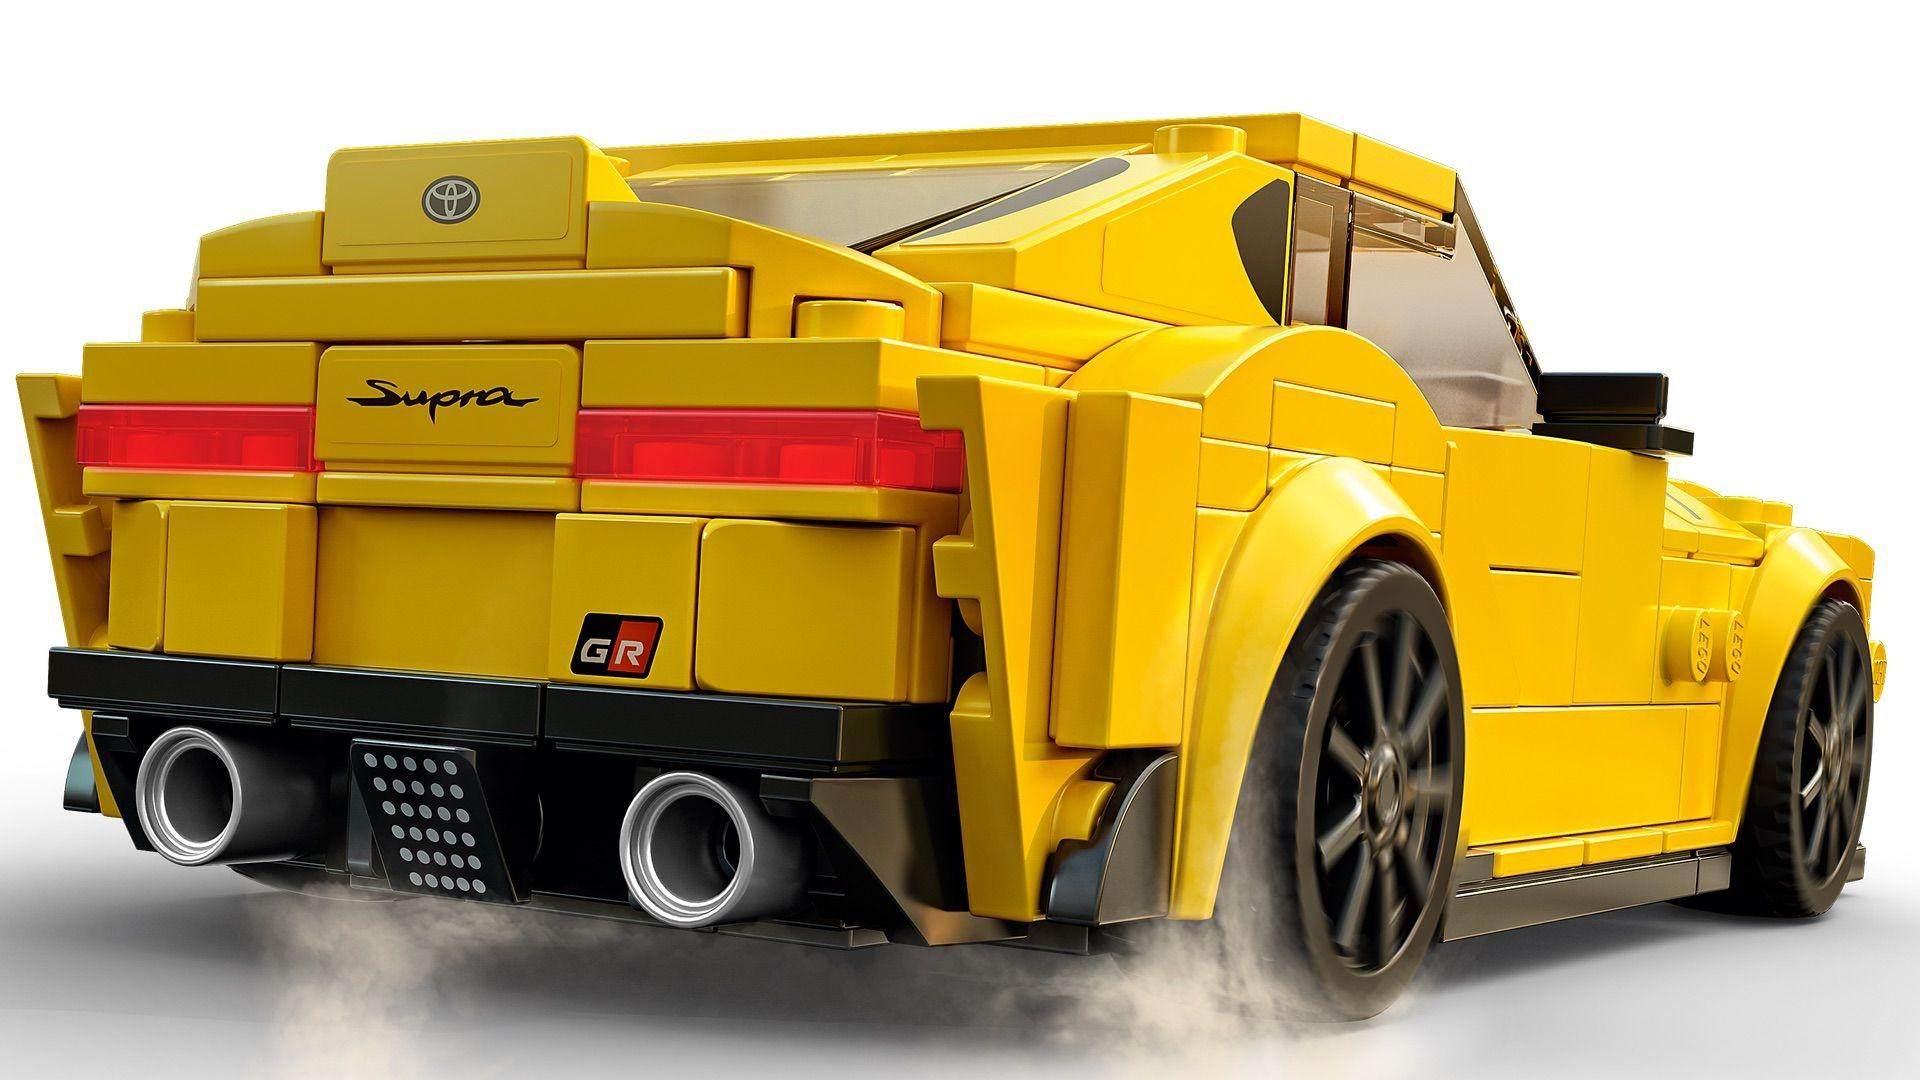 Toyota_GR_Supra_lego-0008